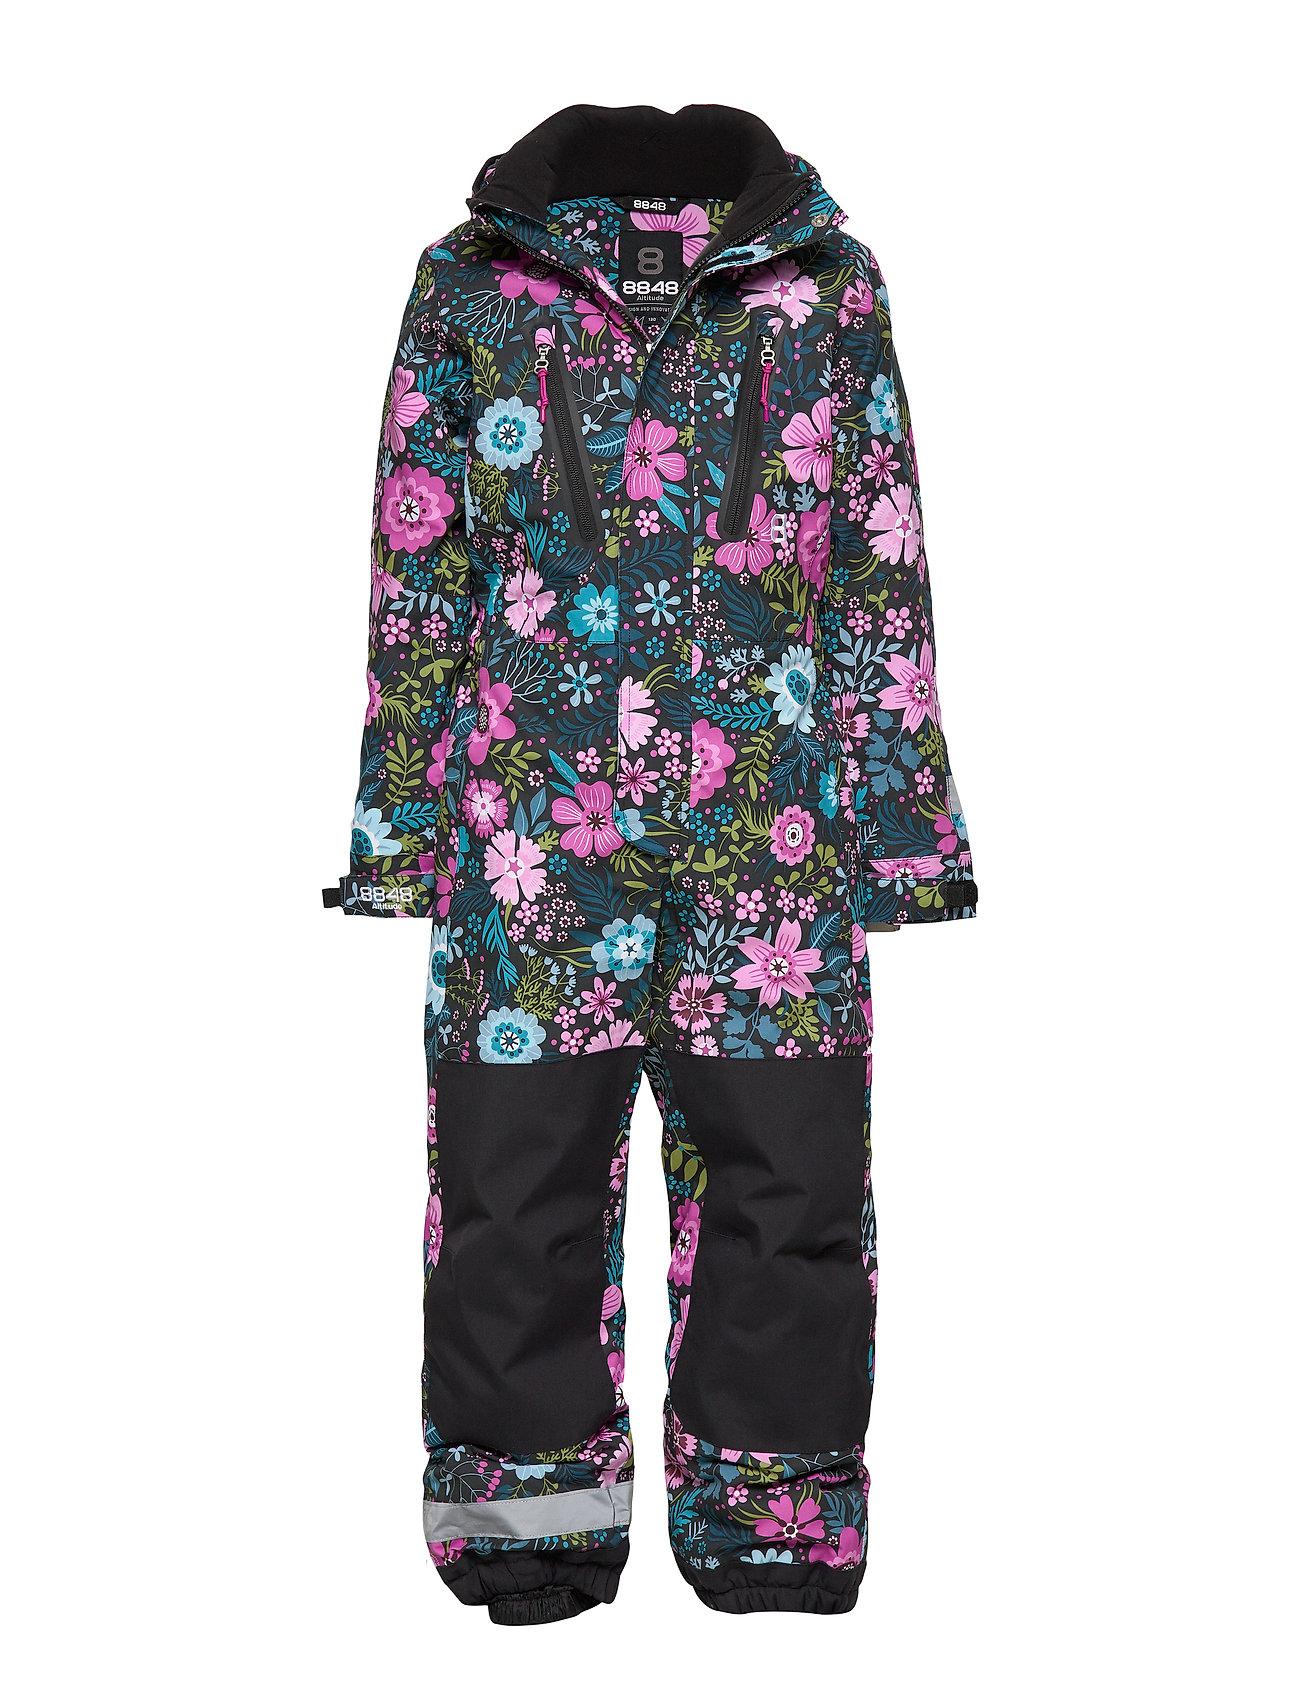 8848 Altitude Karel Minior suit - FLOWER